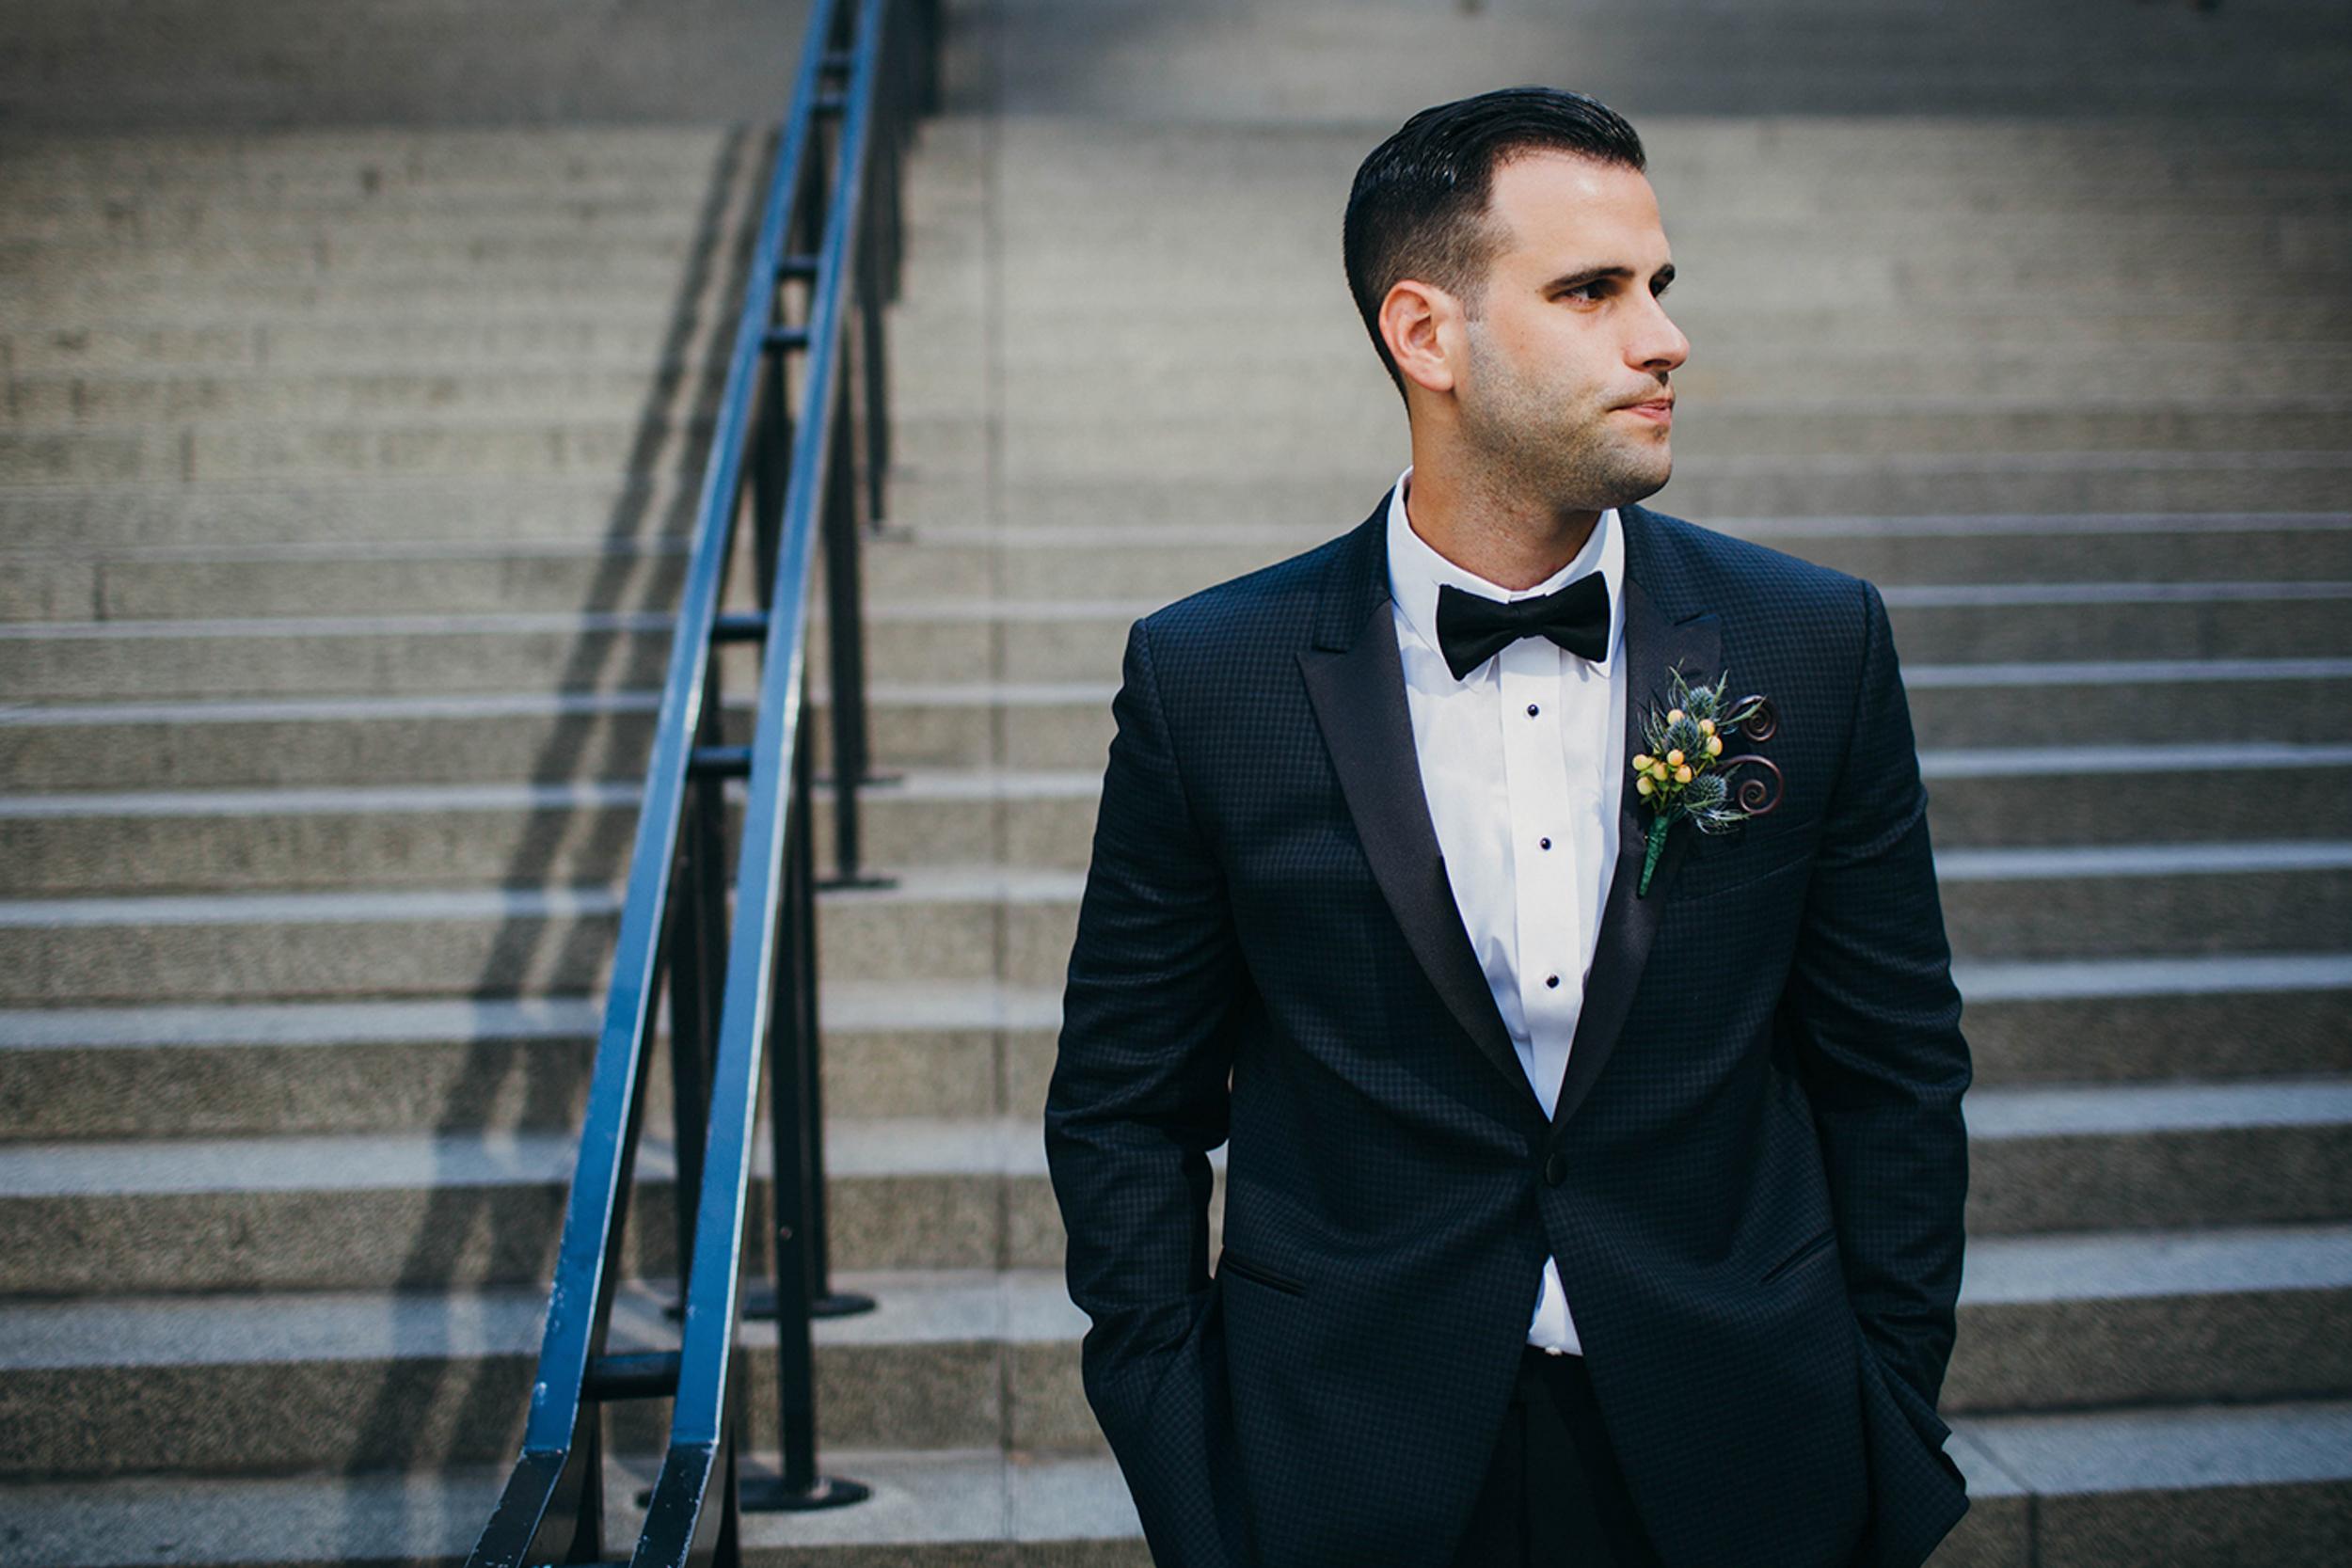 chicago.wedding.urban.intimate.zed451.lake.milton olive park-22.jpg